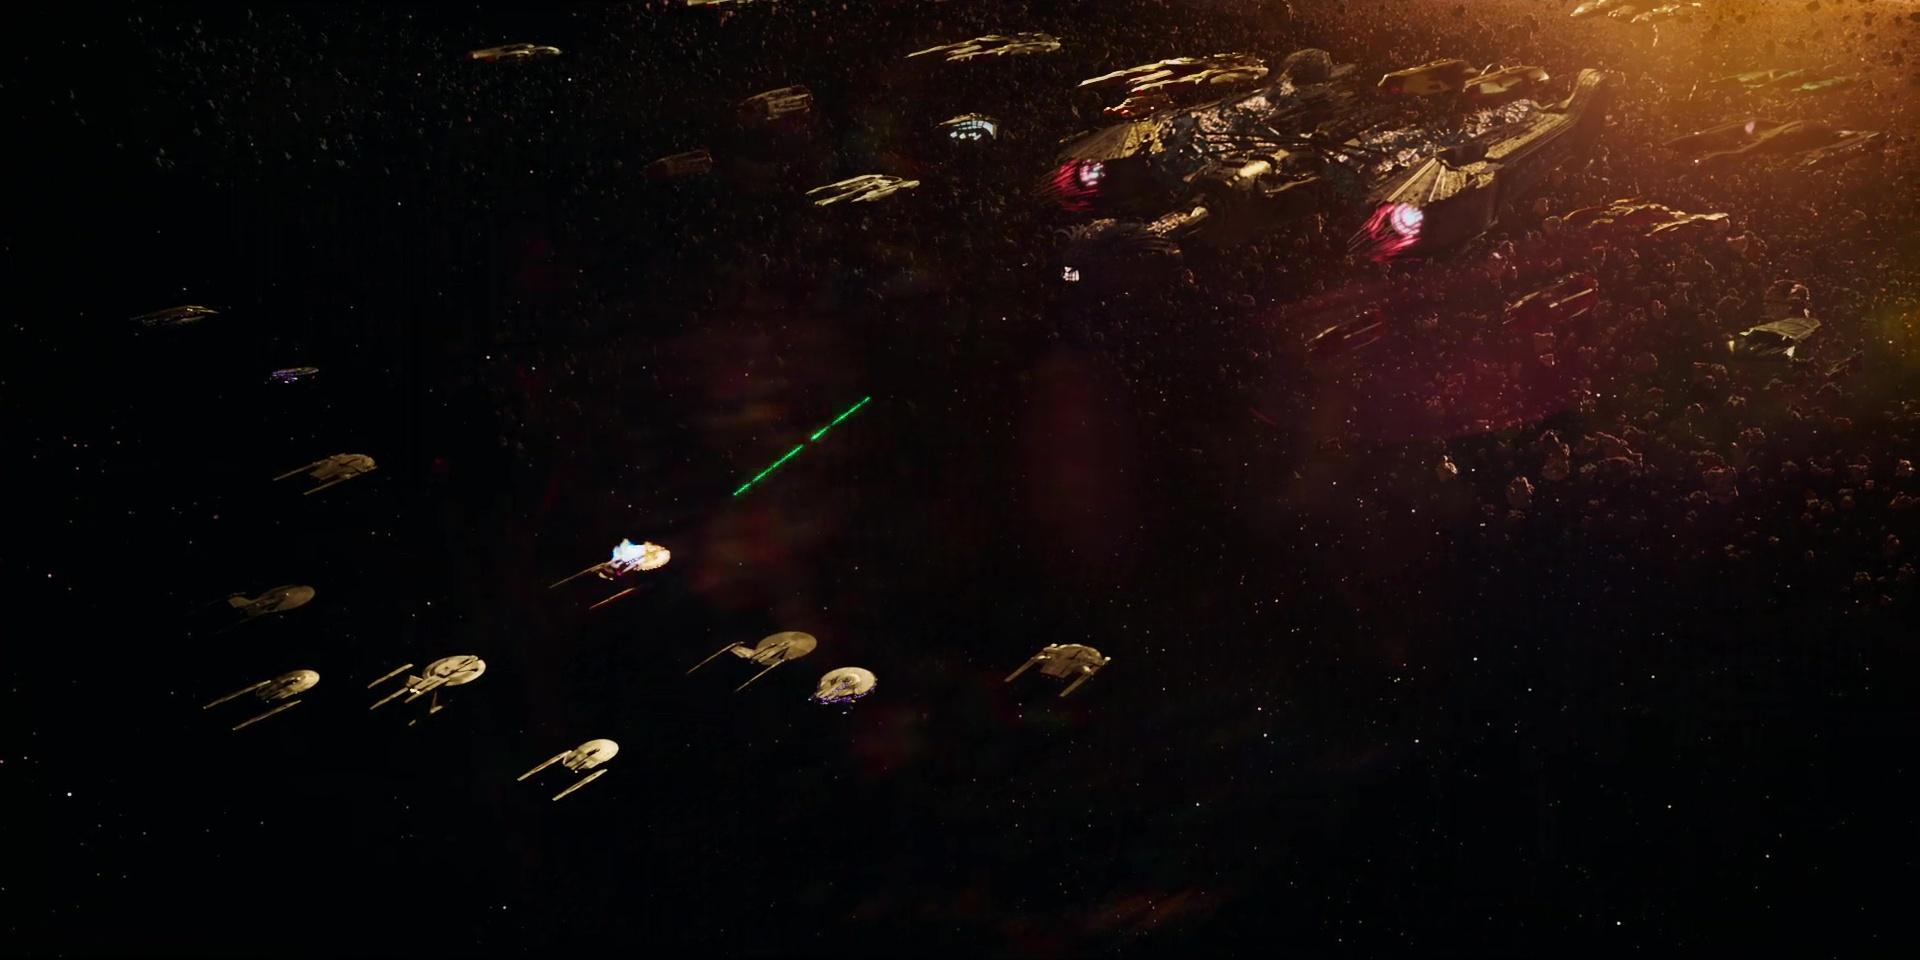 space_battle_star_trek_discovery.jpg